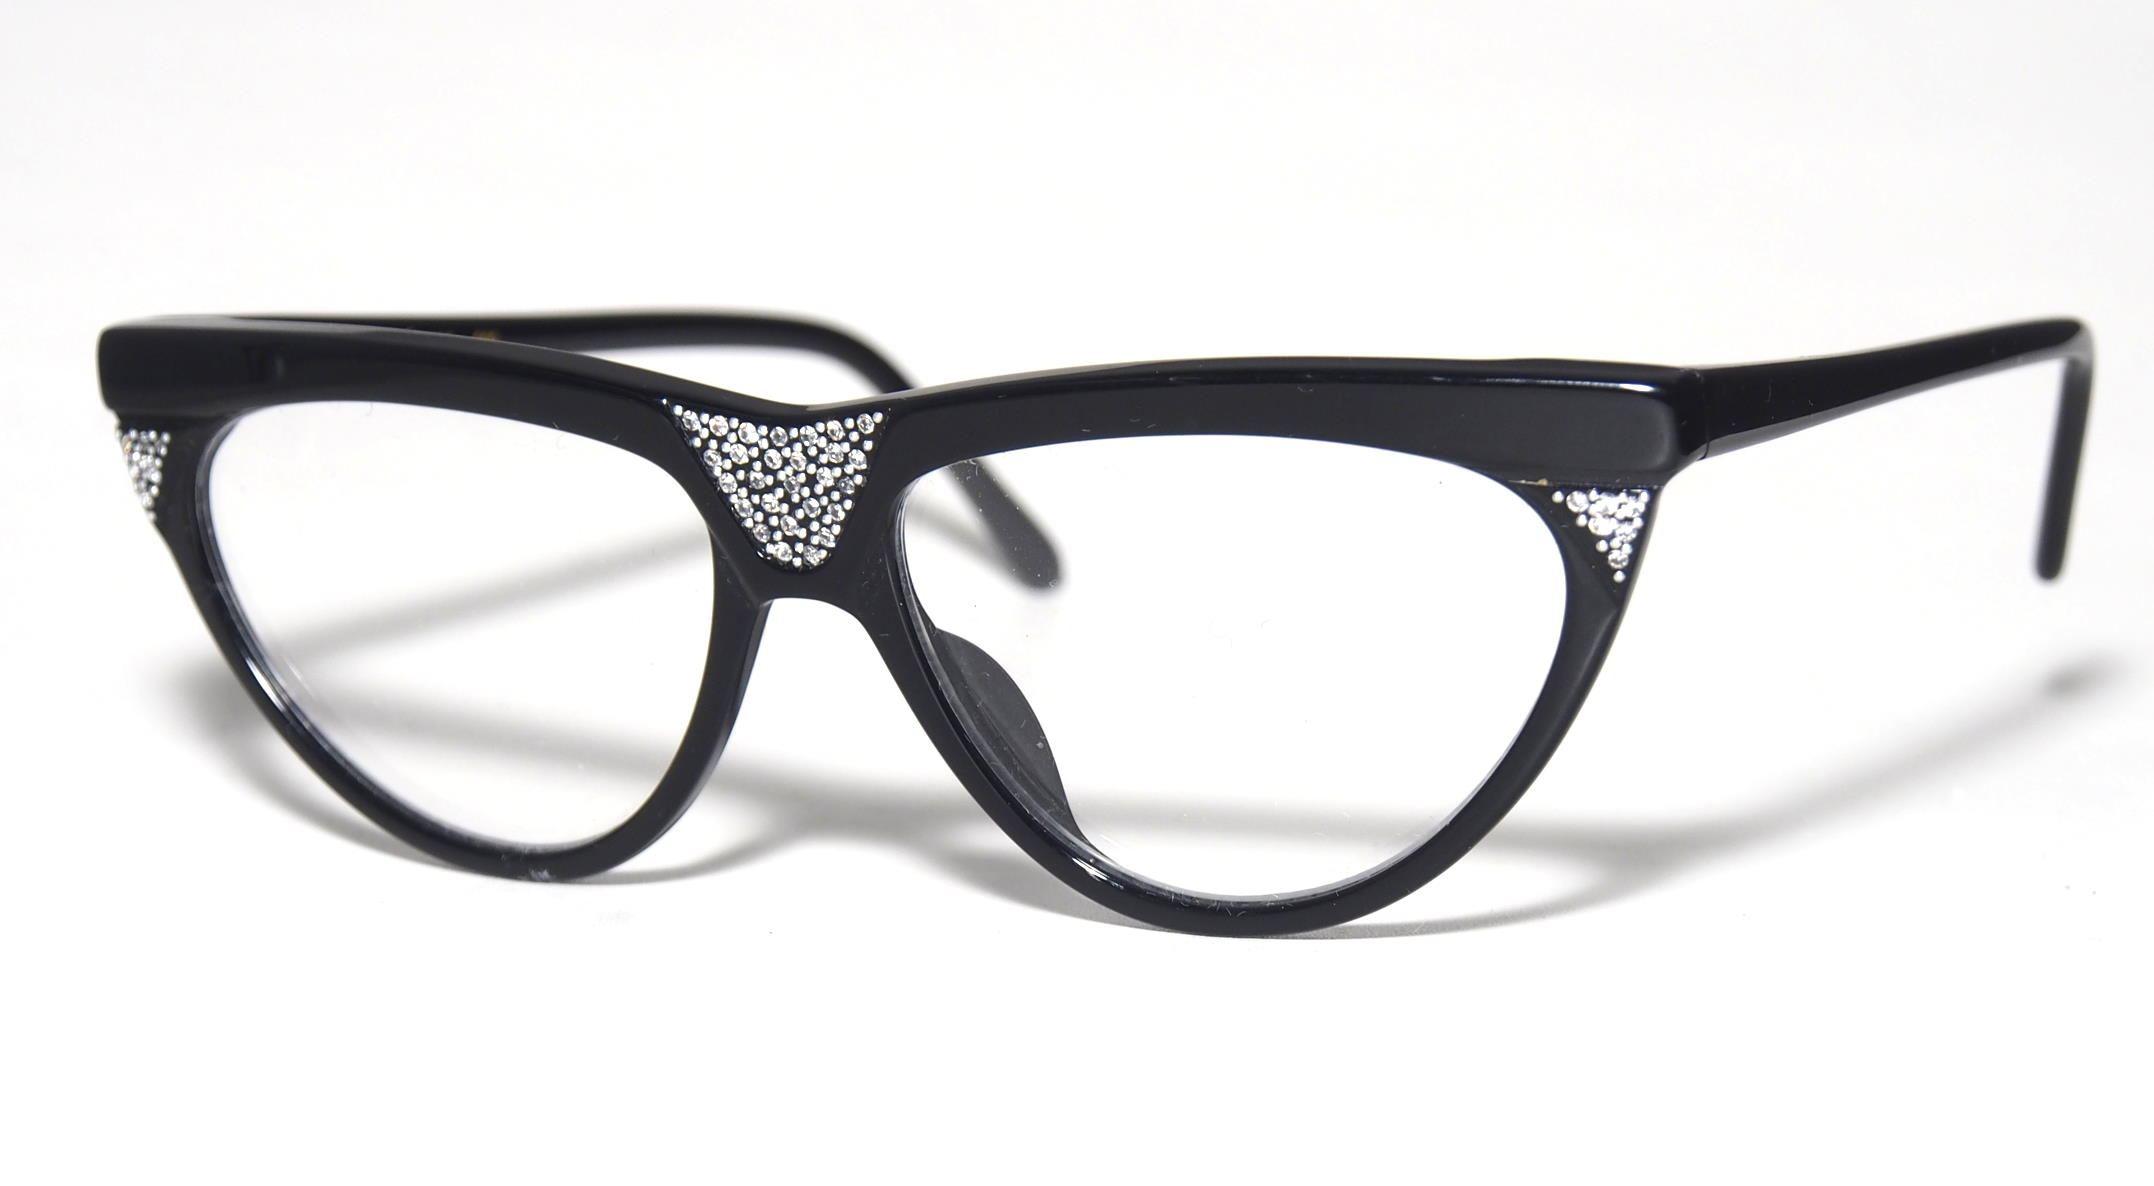 Strass-Vintagebrille der 80er Jahre Modell Plygirl